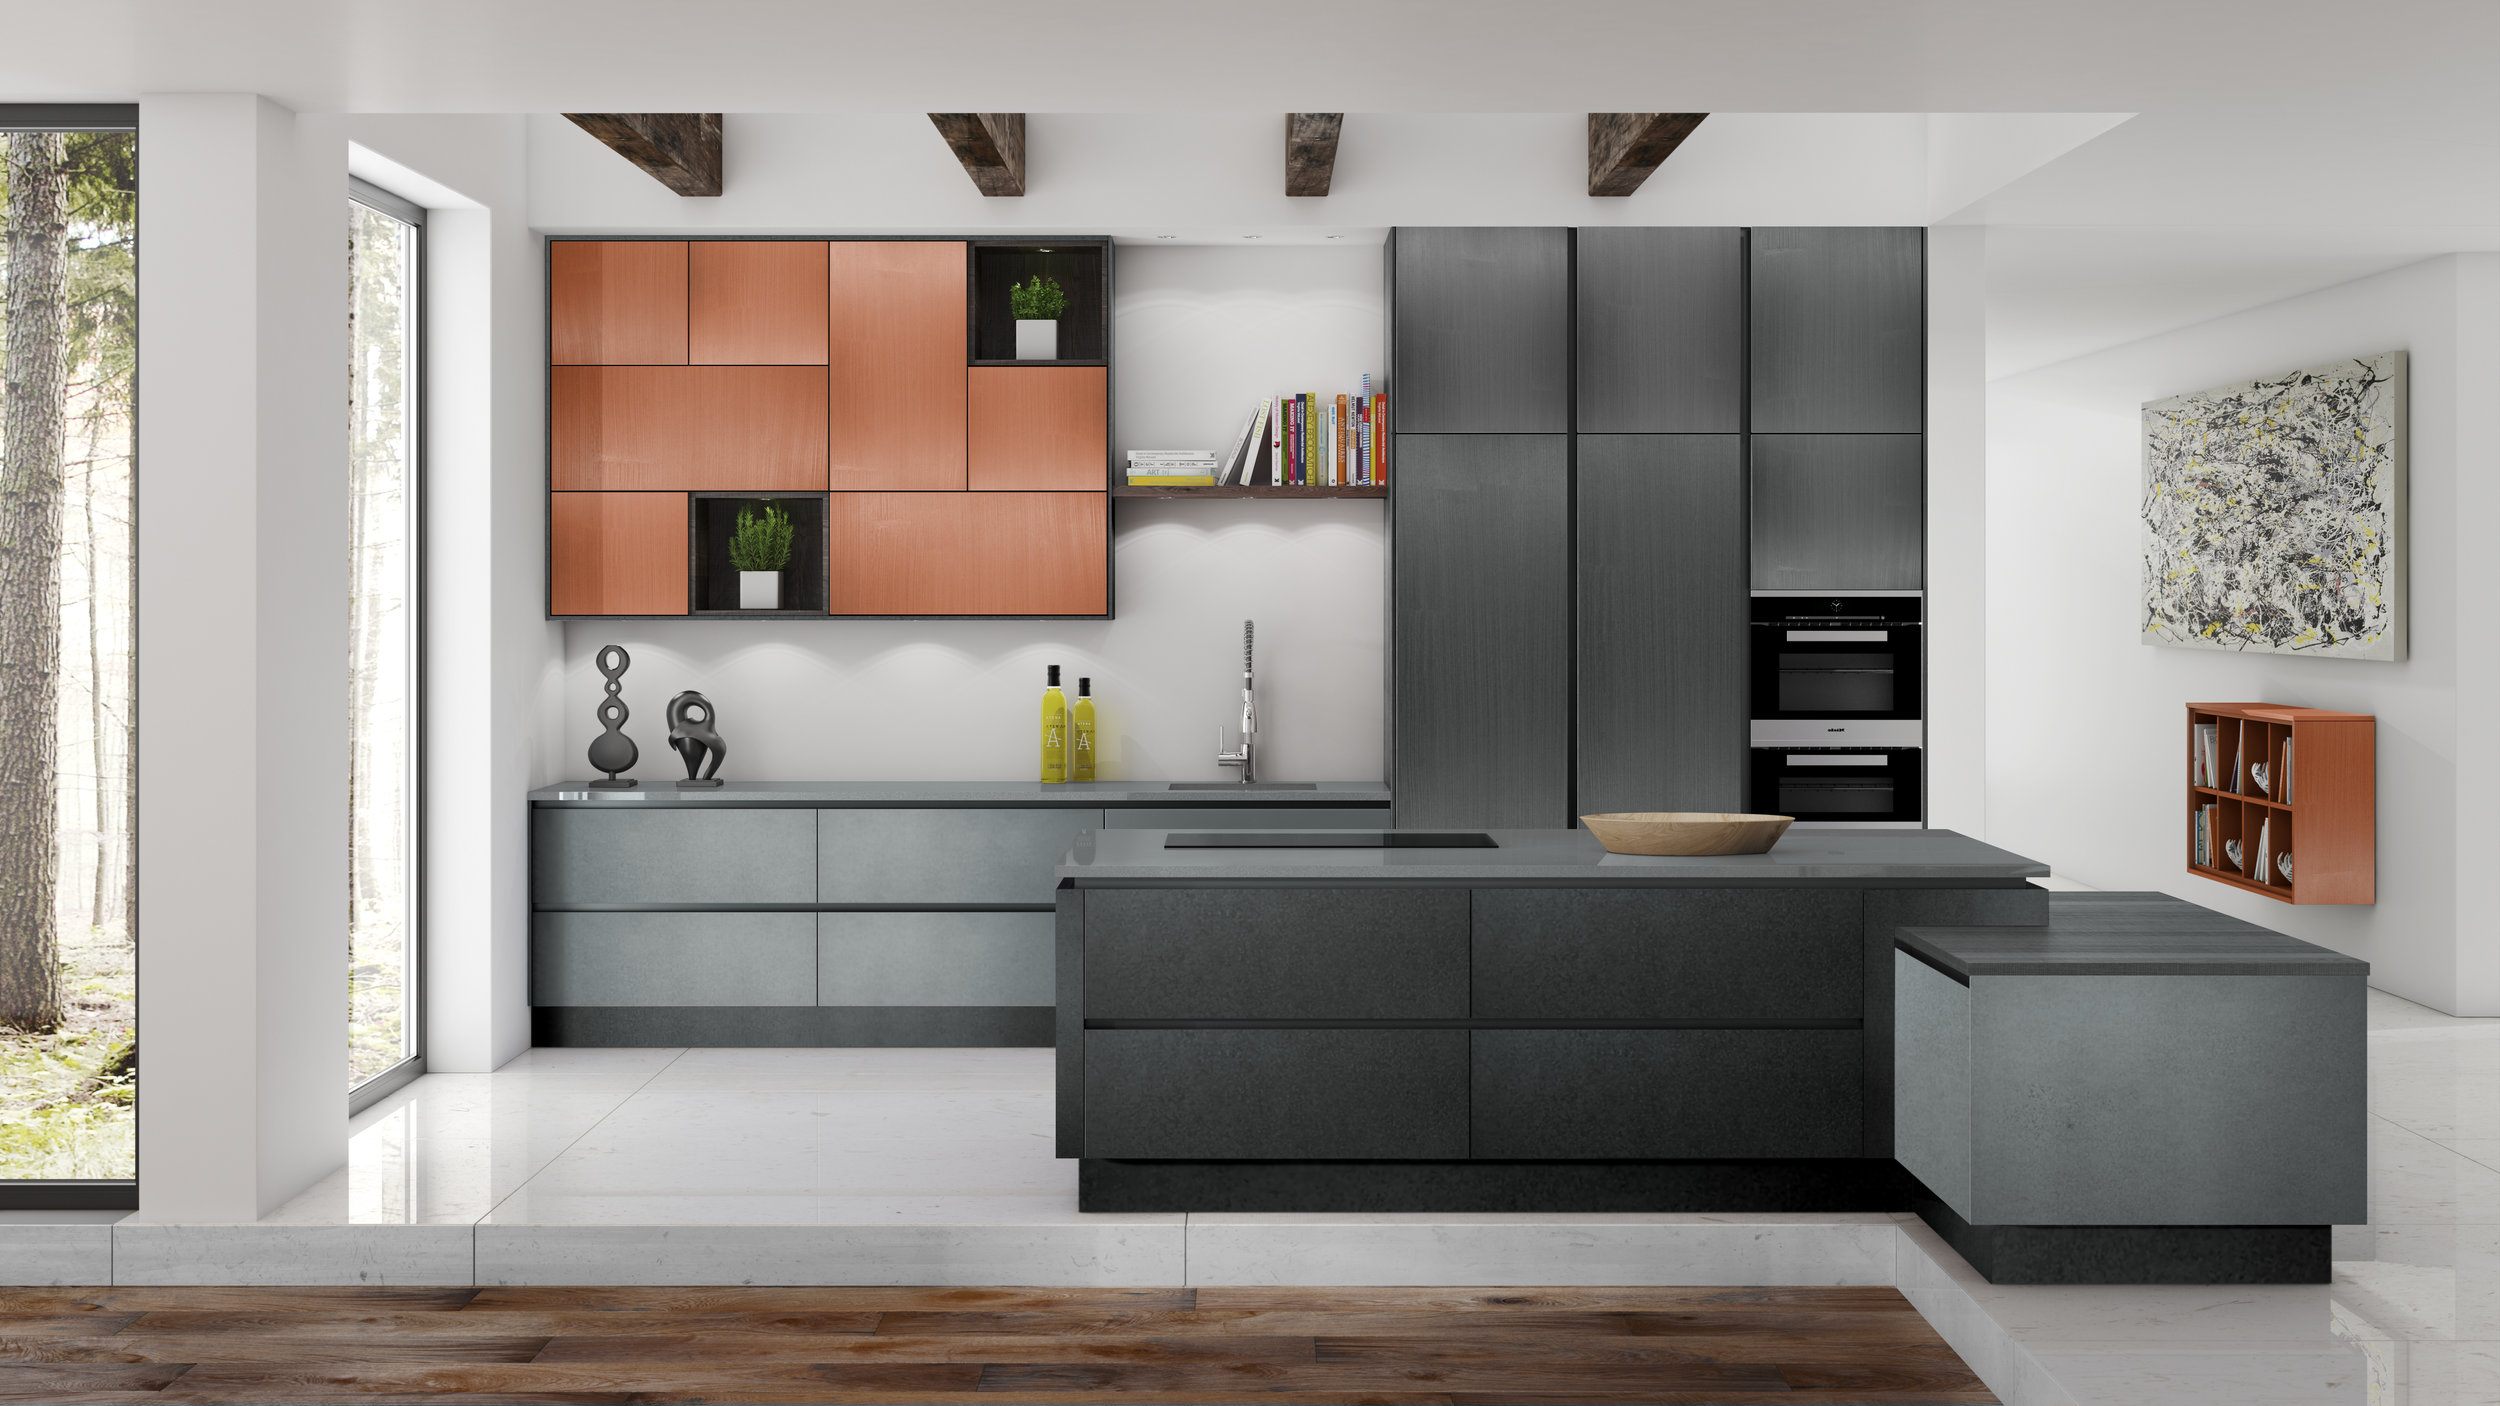 Metallico Roomset - Copper - Dk Steel M6-iloveimg-converted.jpg